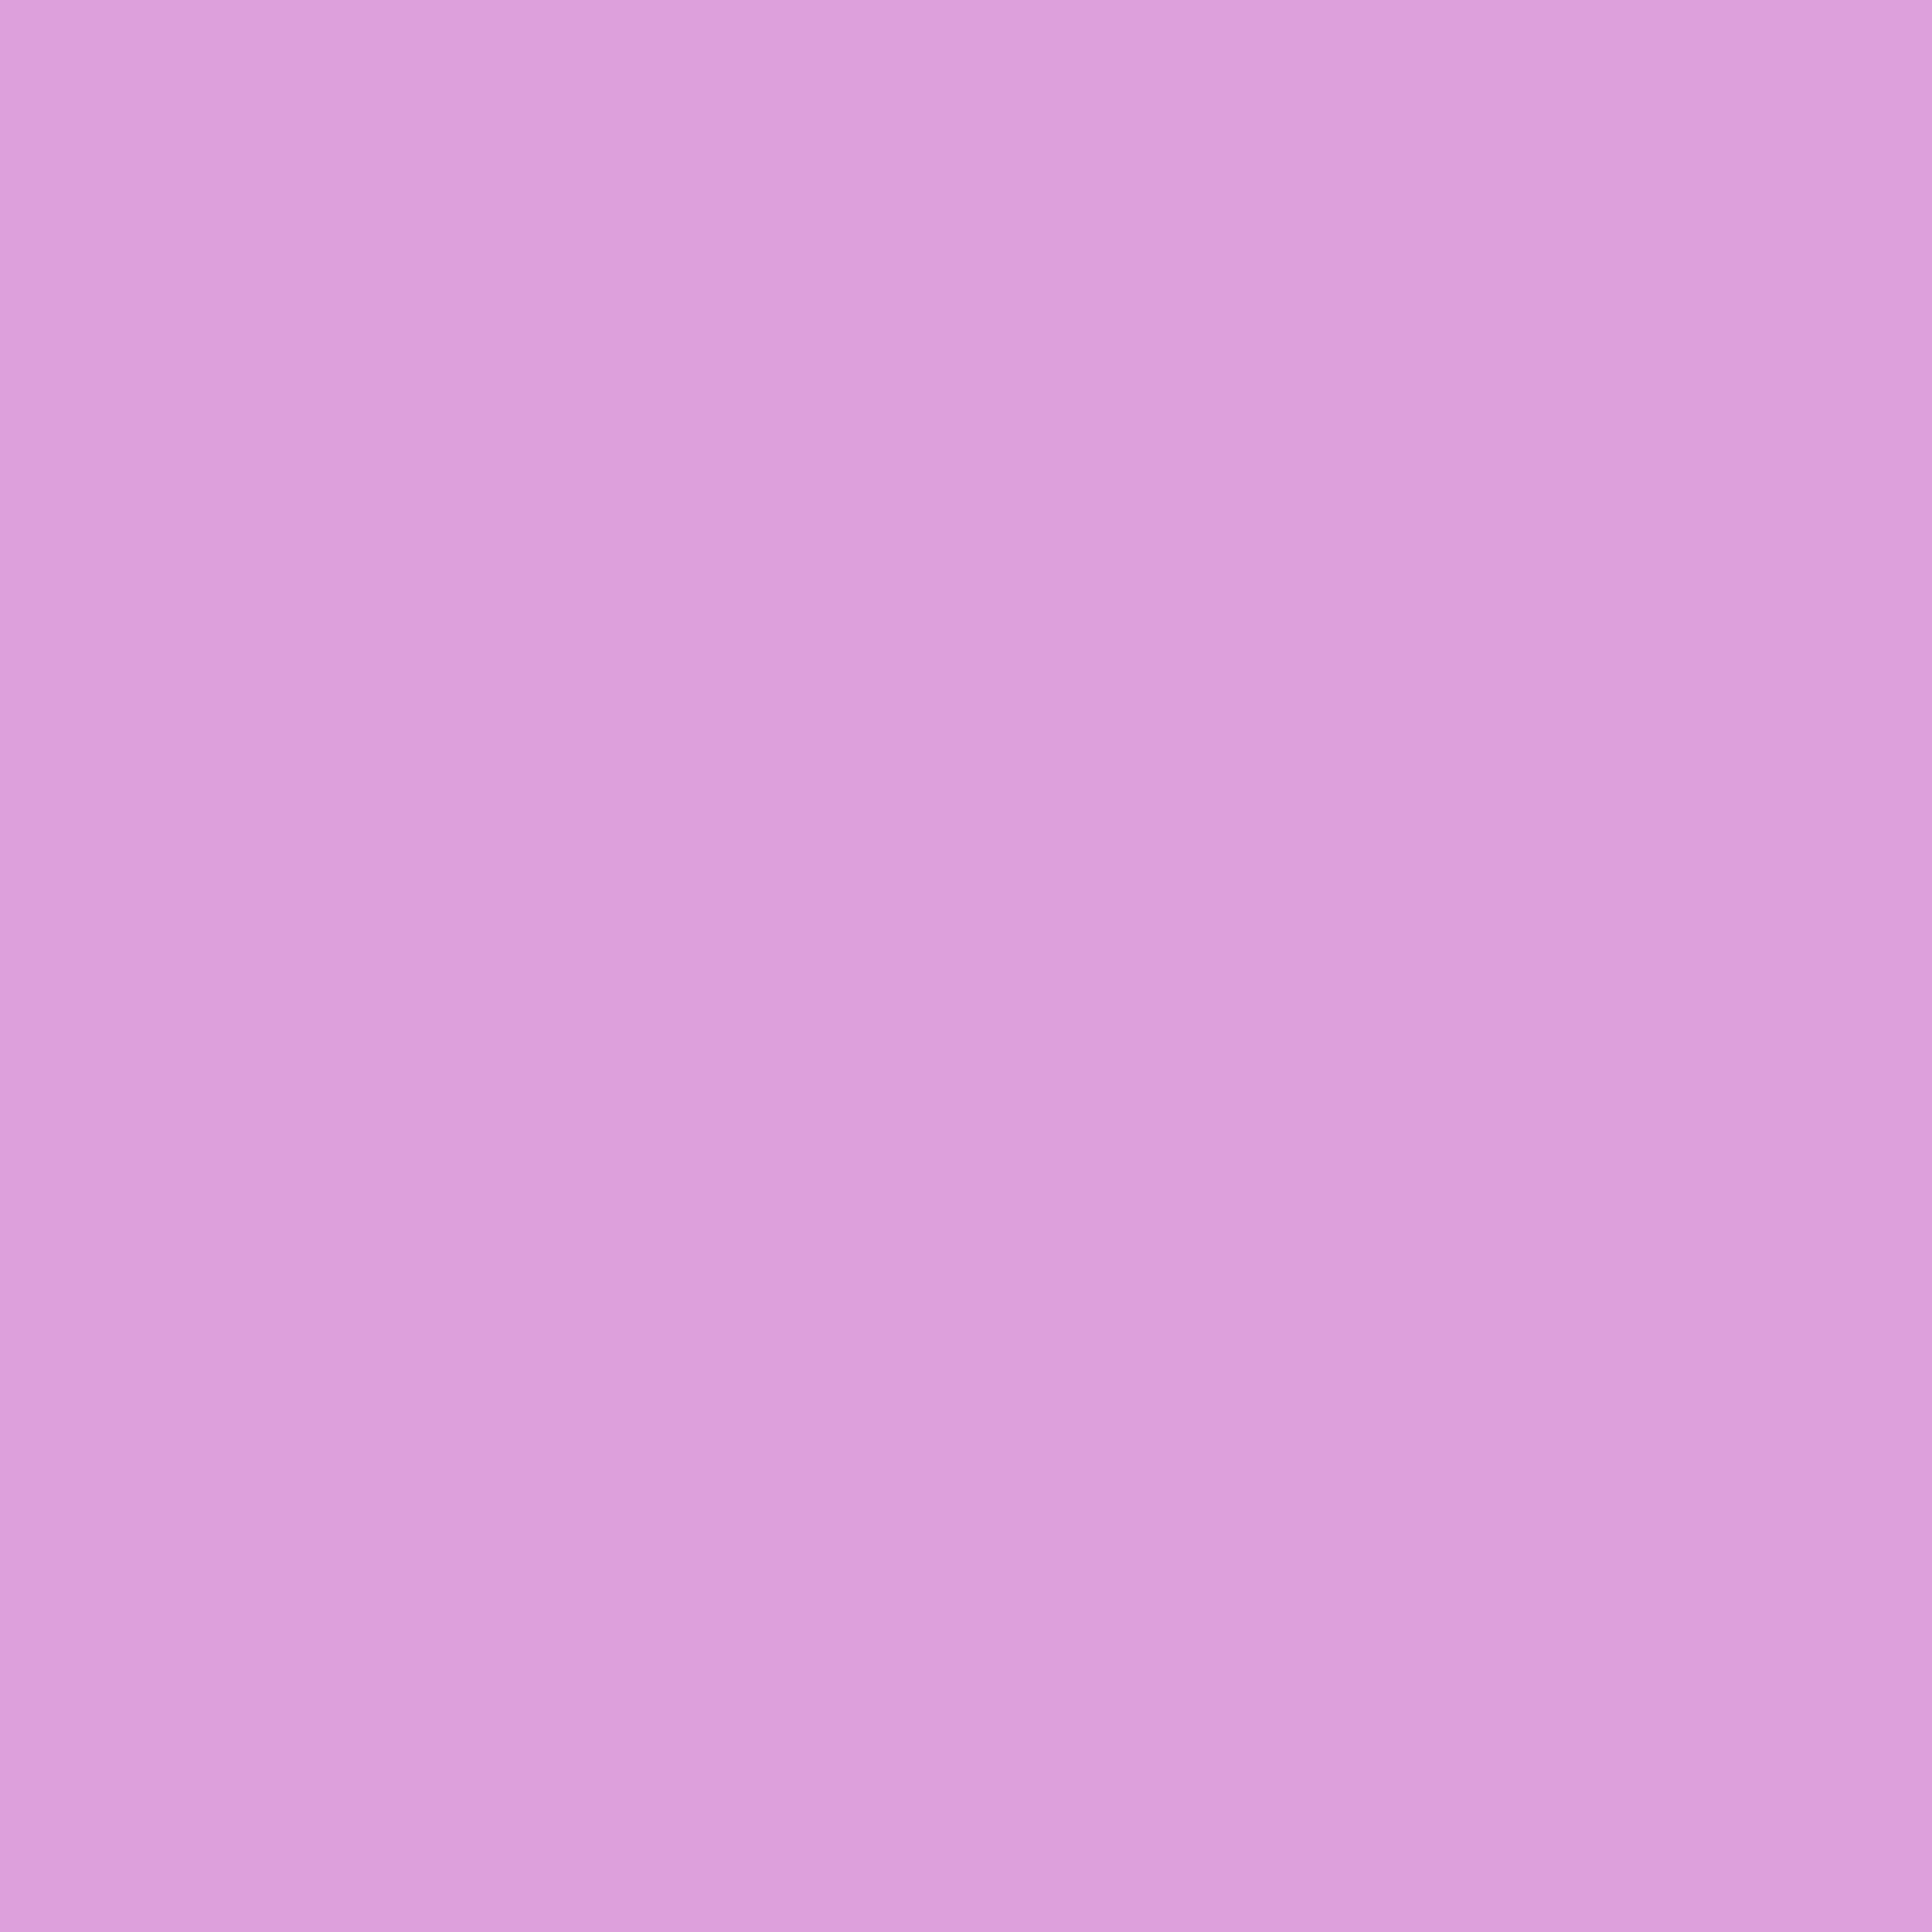 2048x2048 Pale Plum Solid Color Background